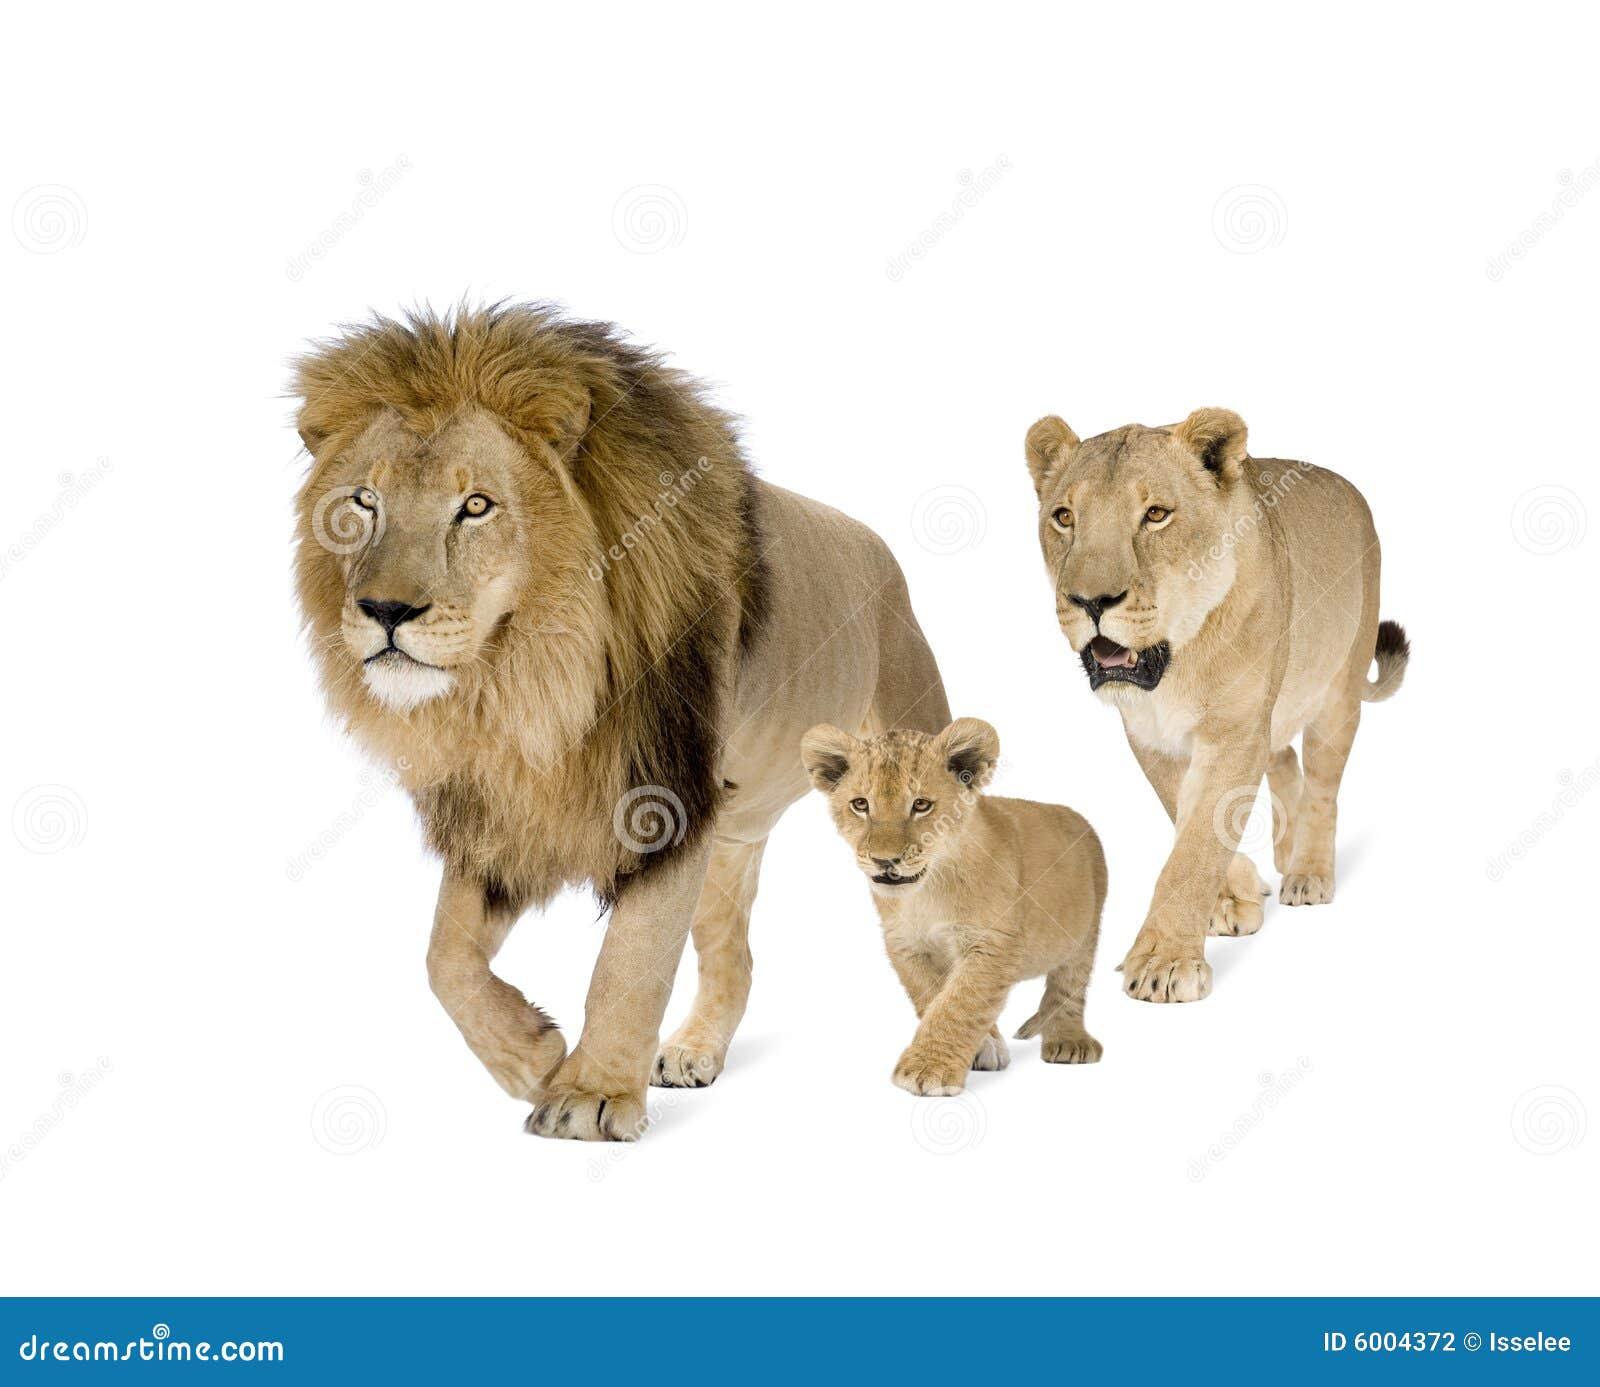 Lion s family